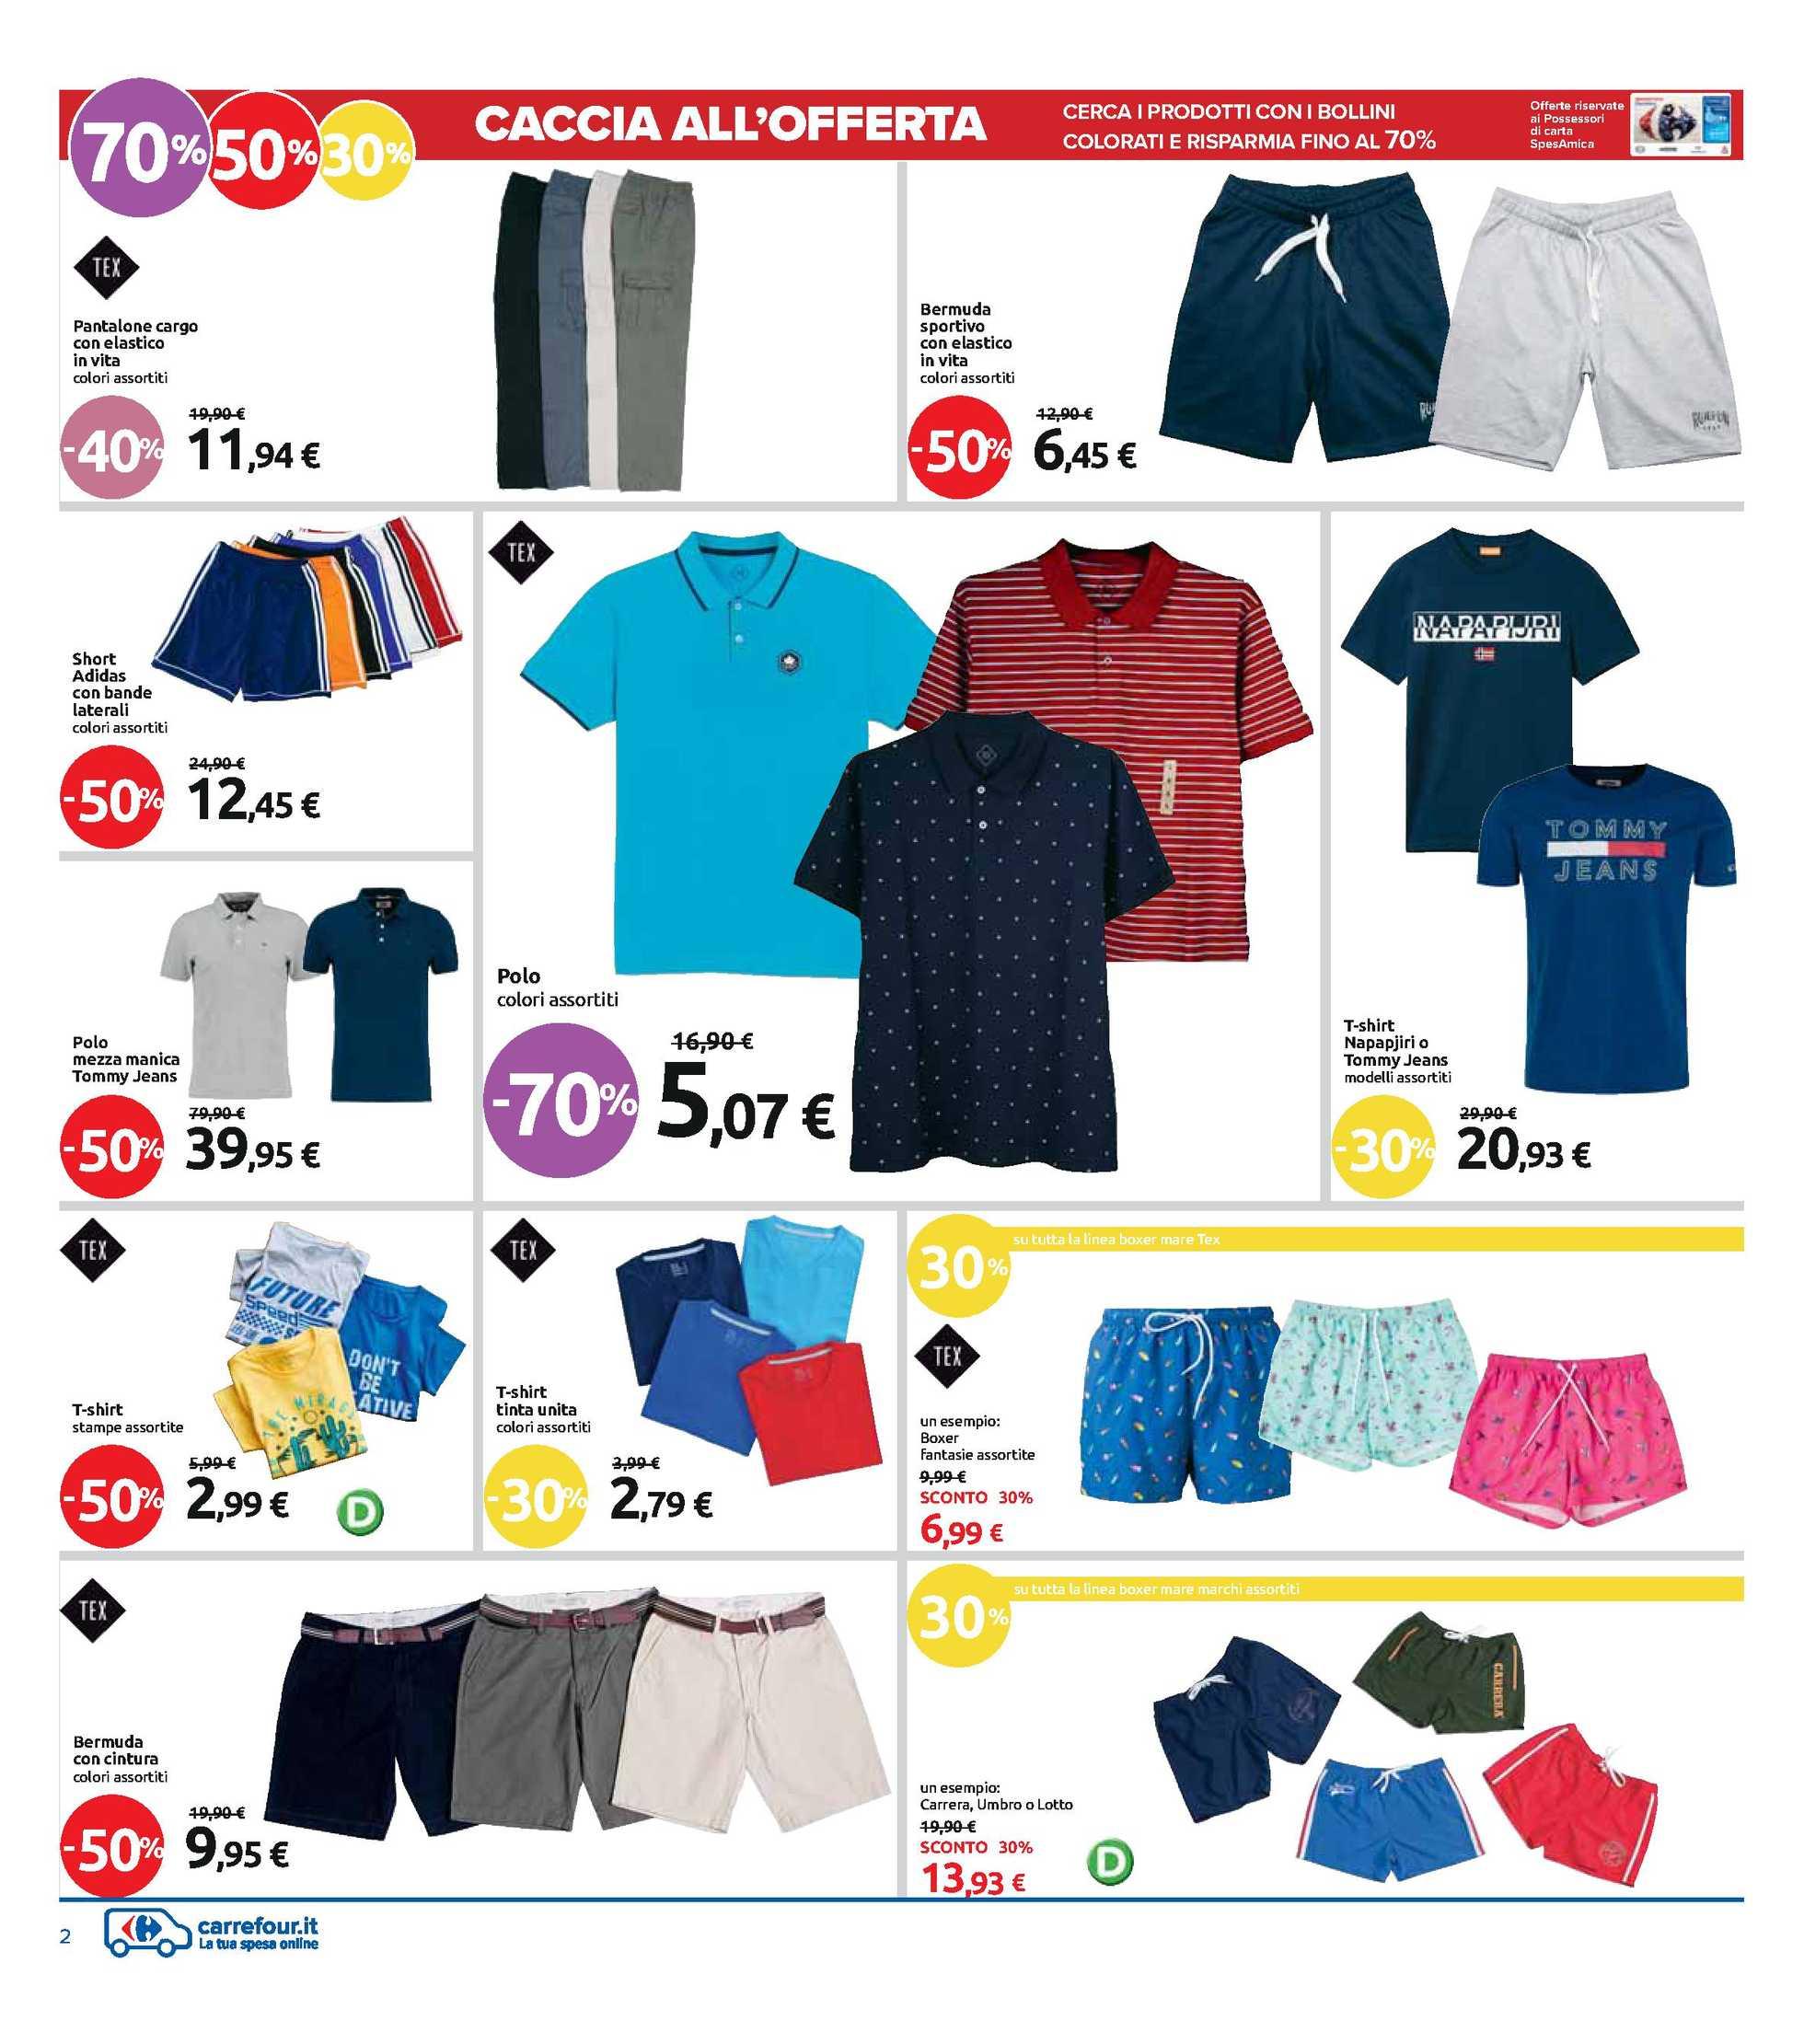 Carrefour Iper - offerte valide dal 07.07.2020 al 16.07.2020 - pagina 3.